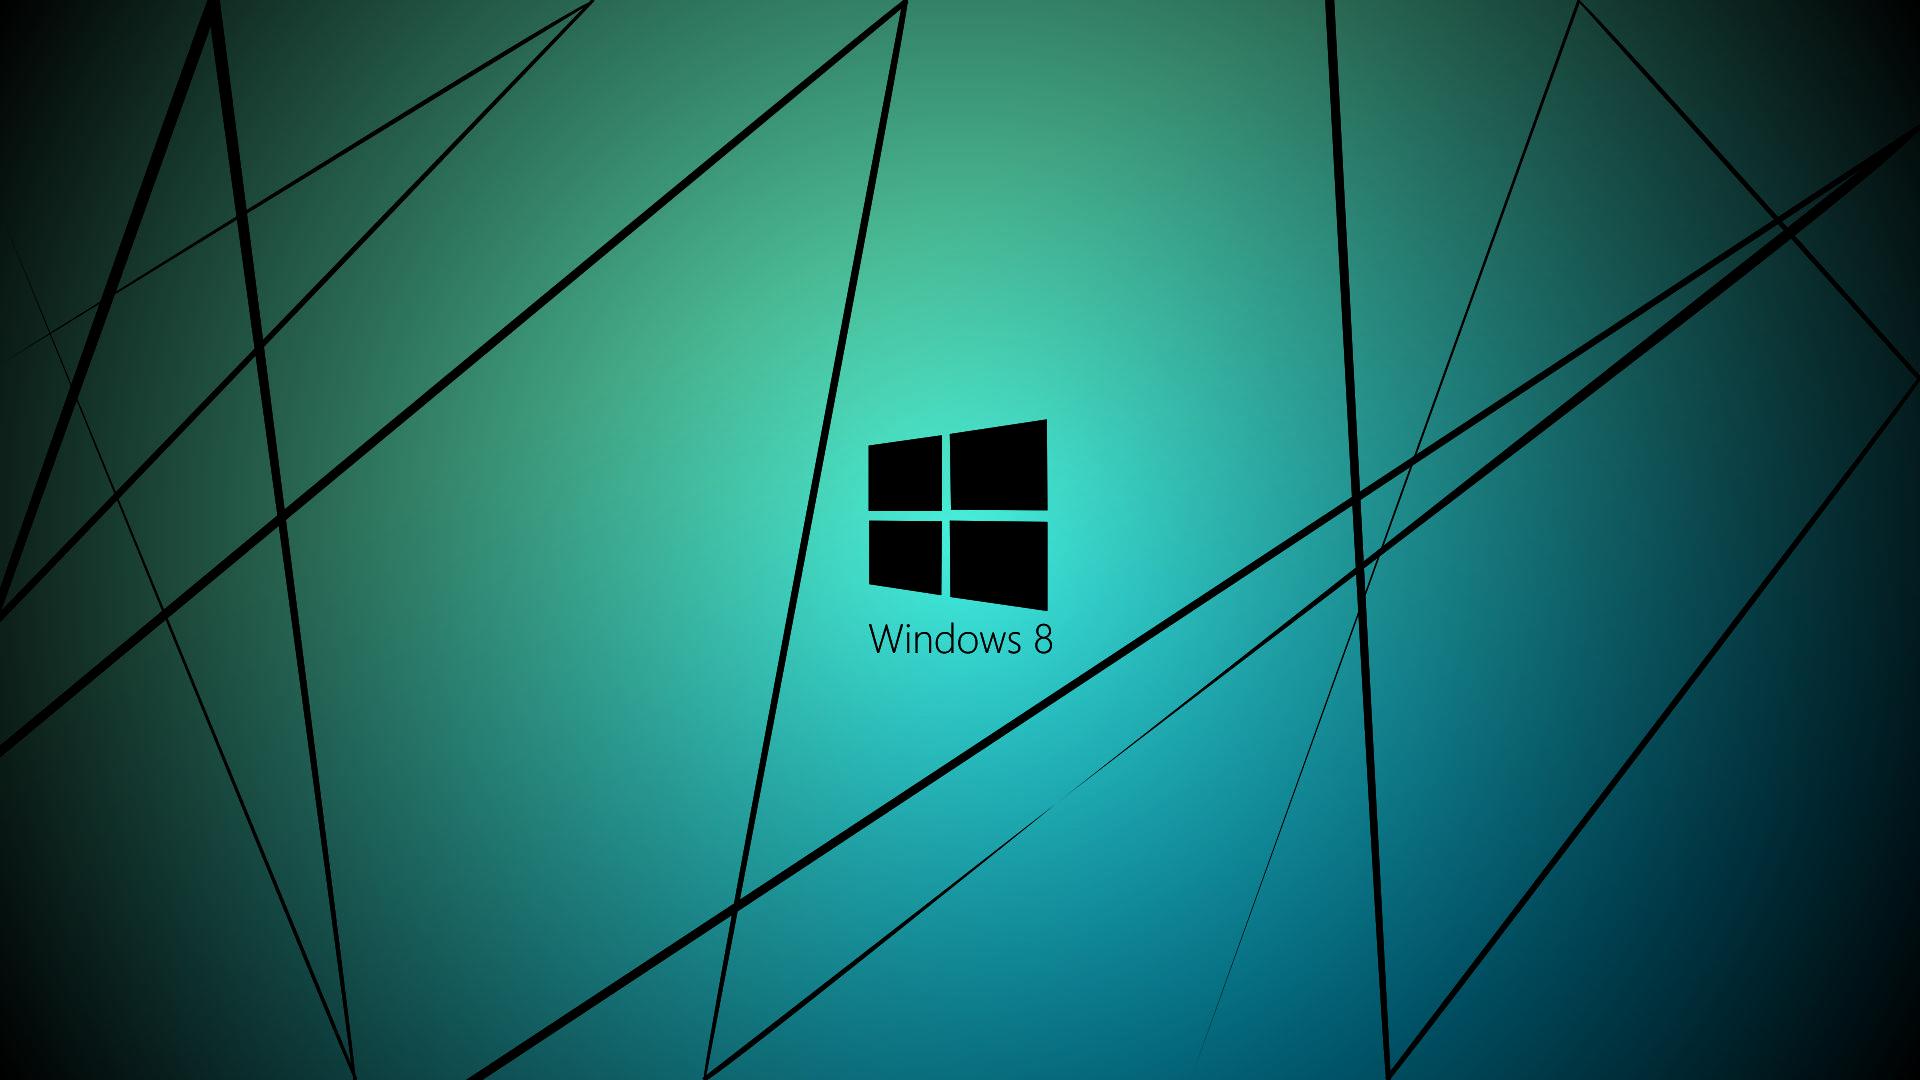 Pin By Meysam Parvizi On 555 Laptop Wallpaper Desktop Wallpapers Windows Wallpaper Broken Screen Wallpaper